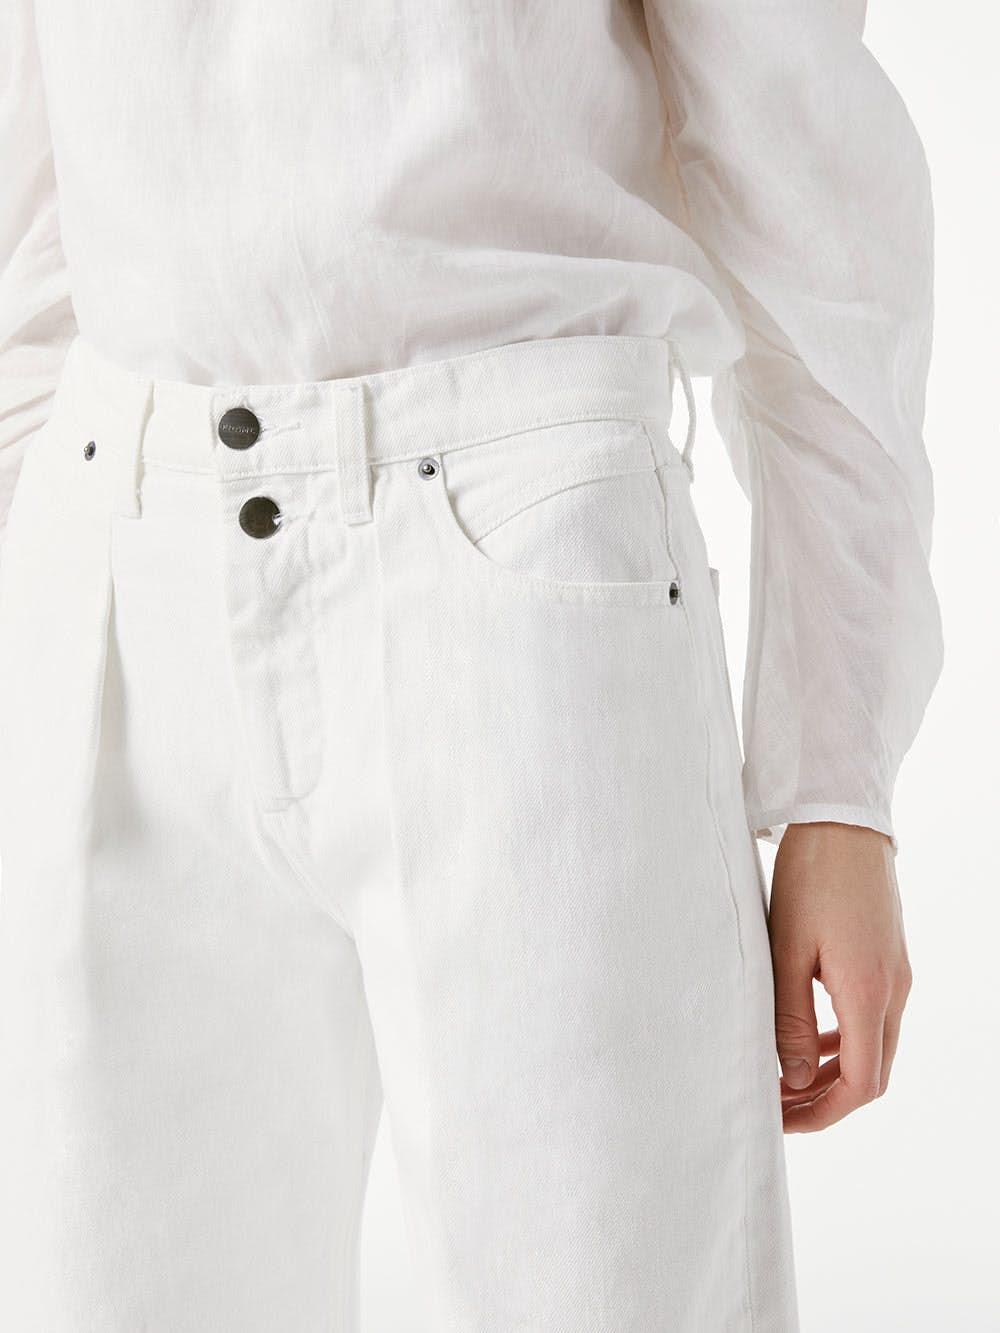 jeans detail view alt:hover